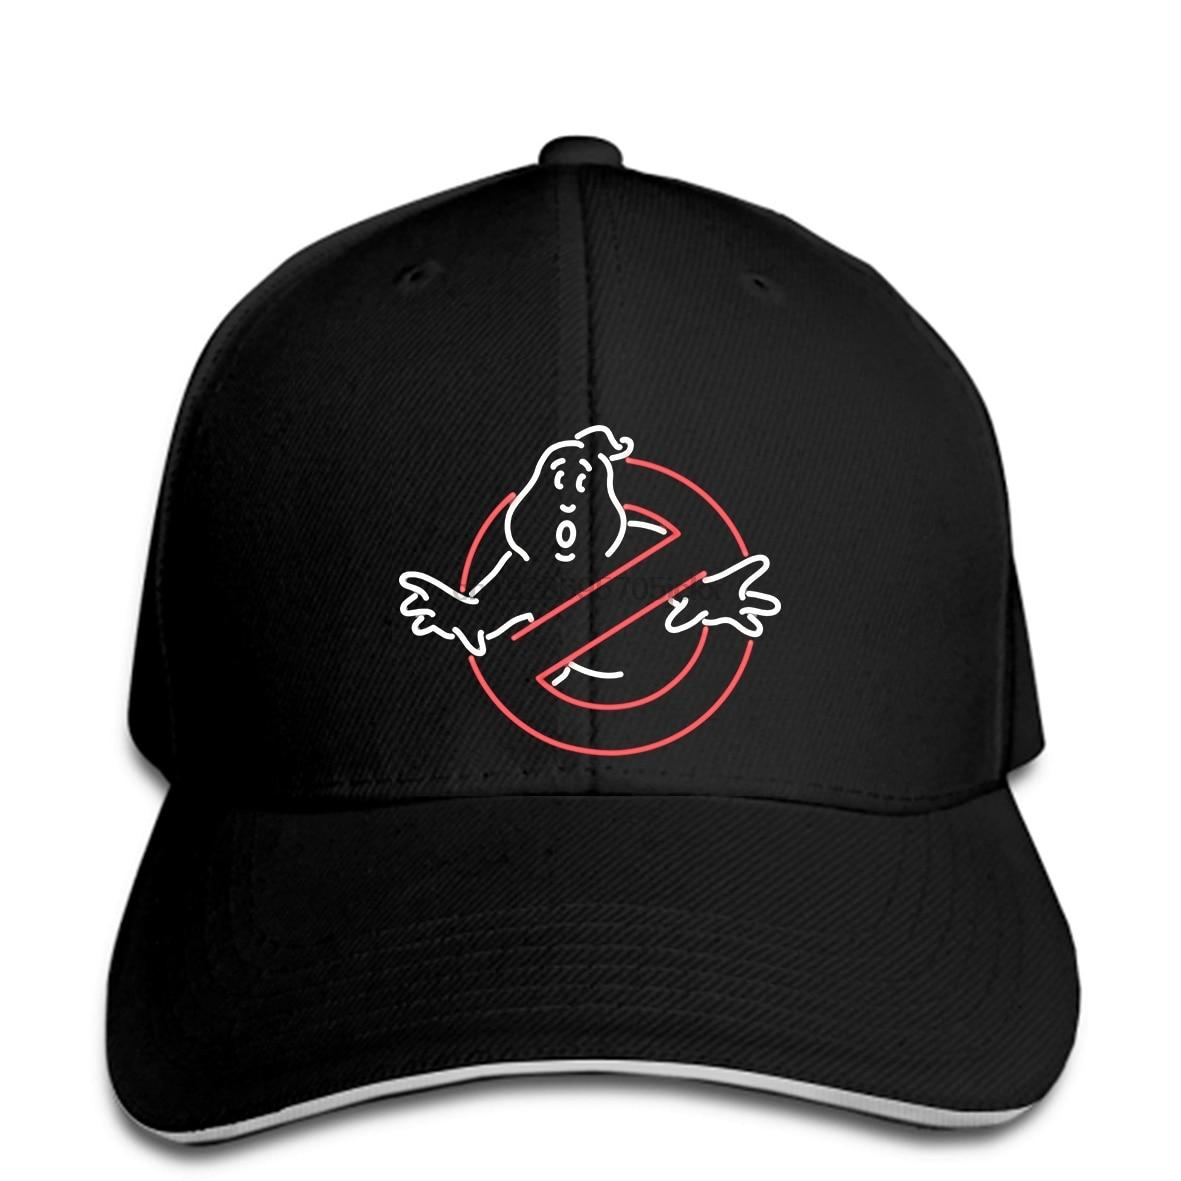 Cazafantasmas (cazafantasmas fantasma) para hombre gorra de béisbol estilo neón sin logotipo fantasma imagen snapback sombrero pico